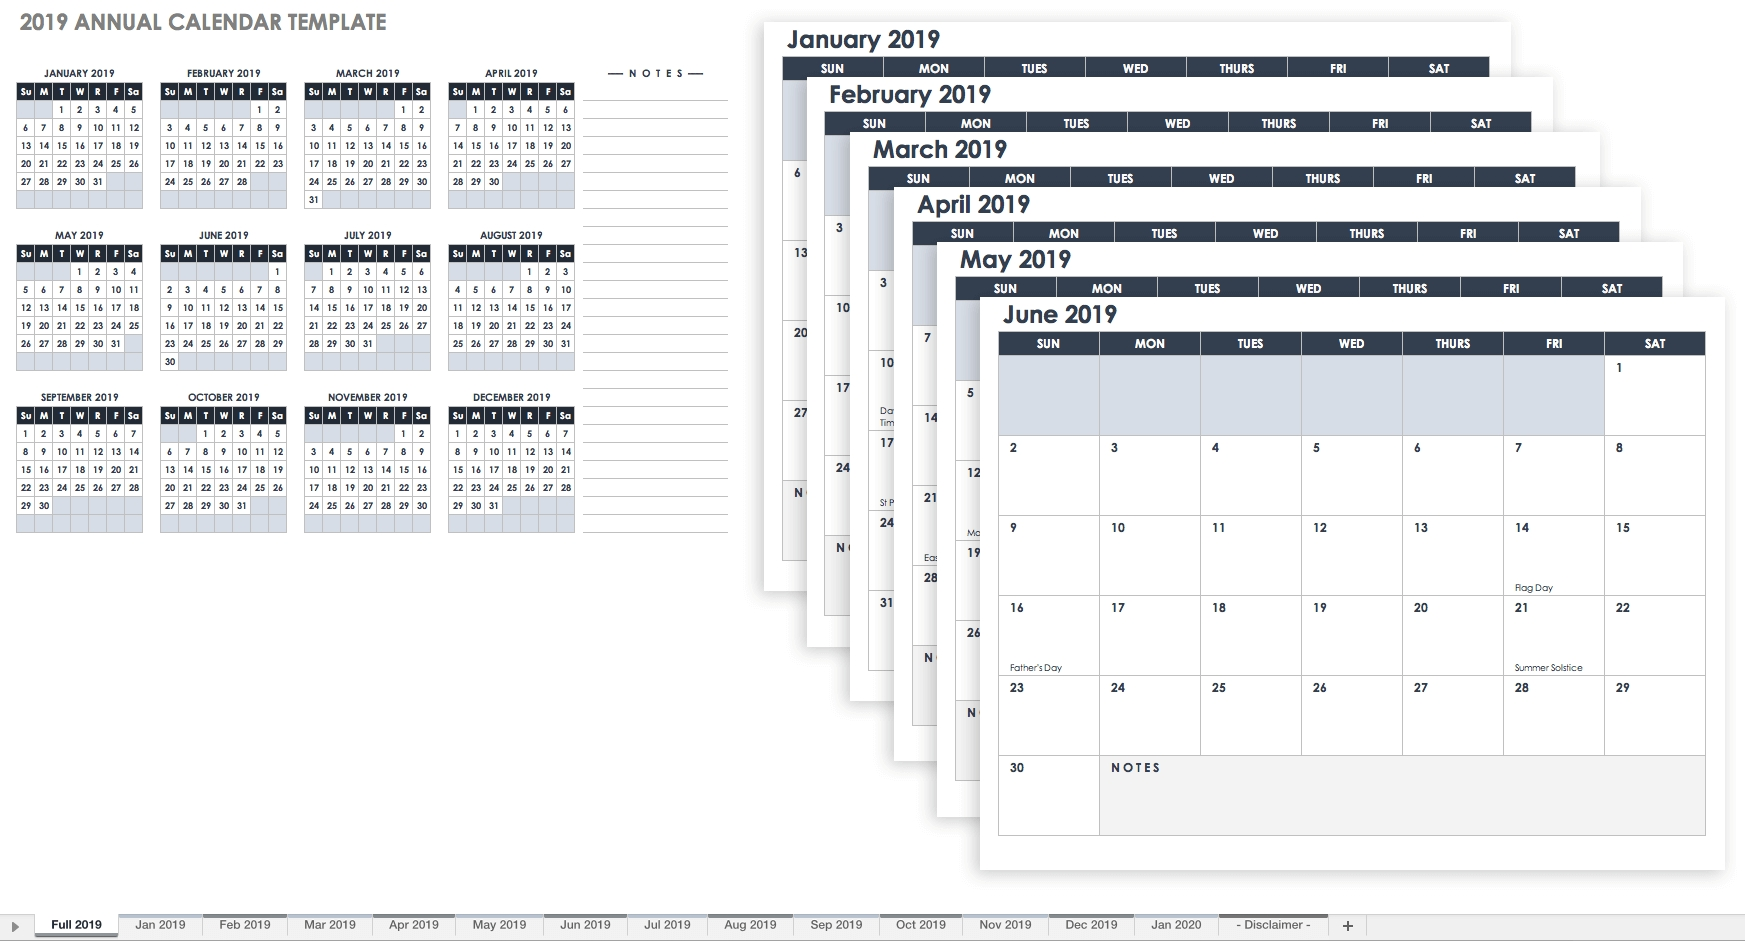 15 Free Monthly Calendar Templates | Smartsheet regarding Free Monthly Calendars To Print